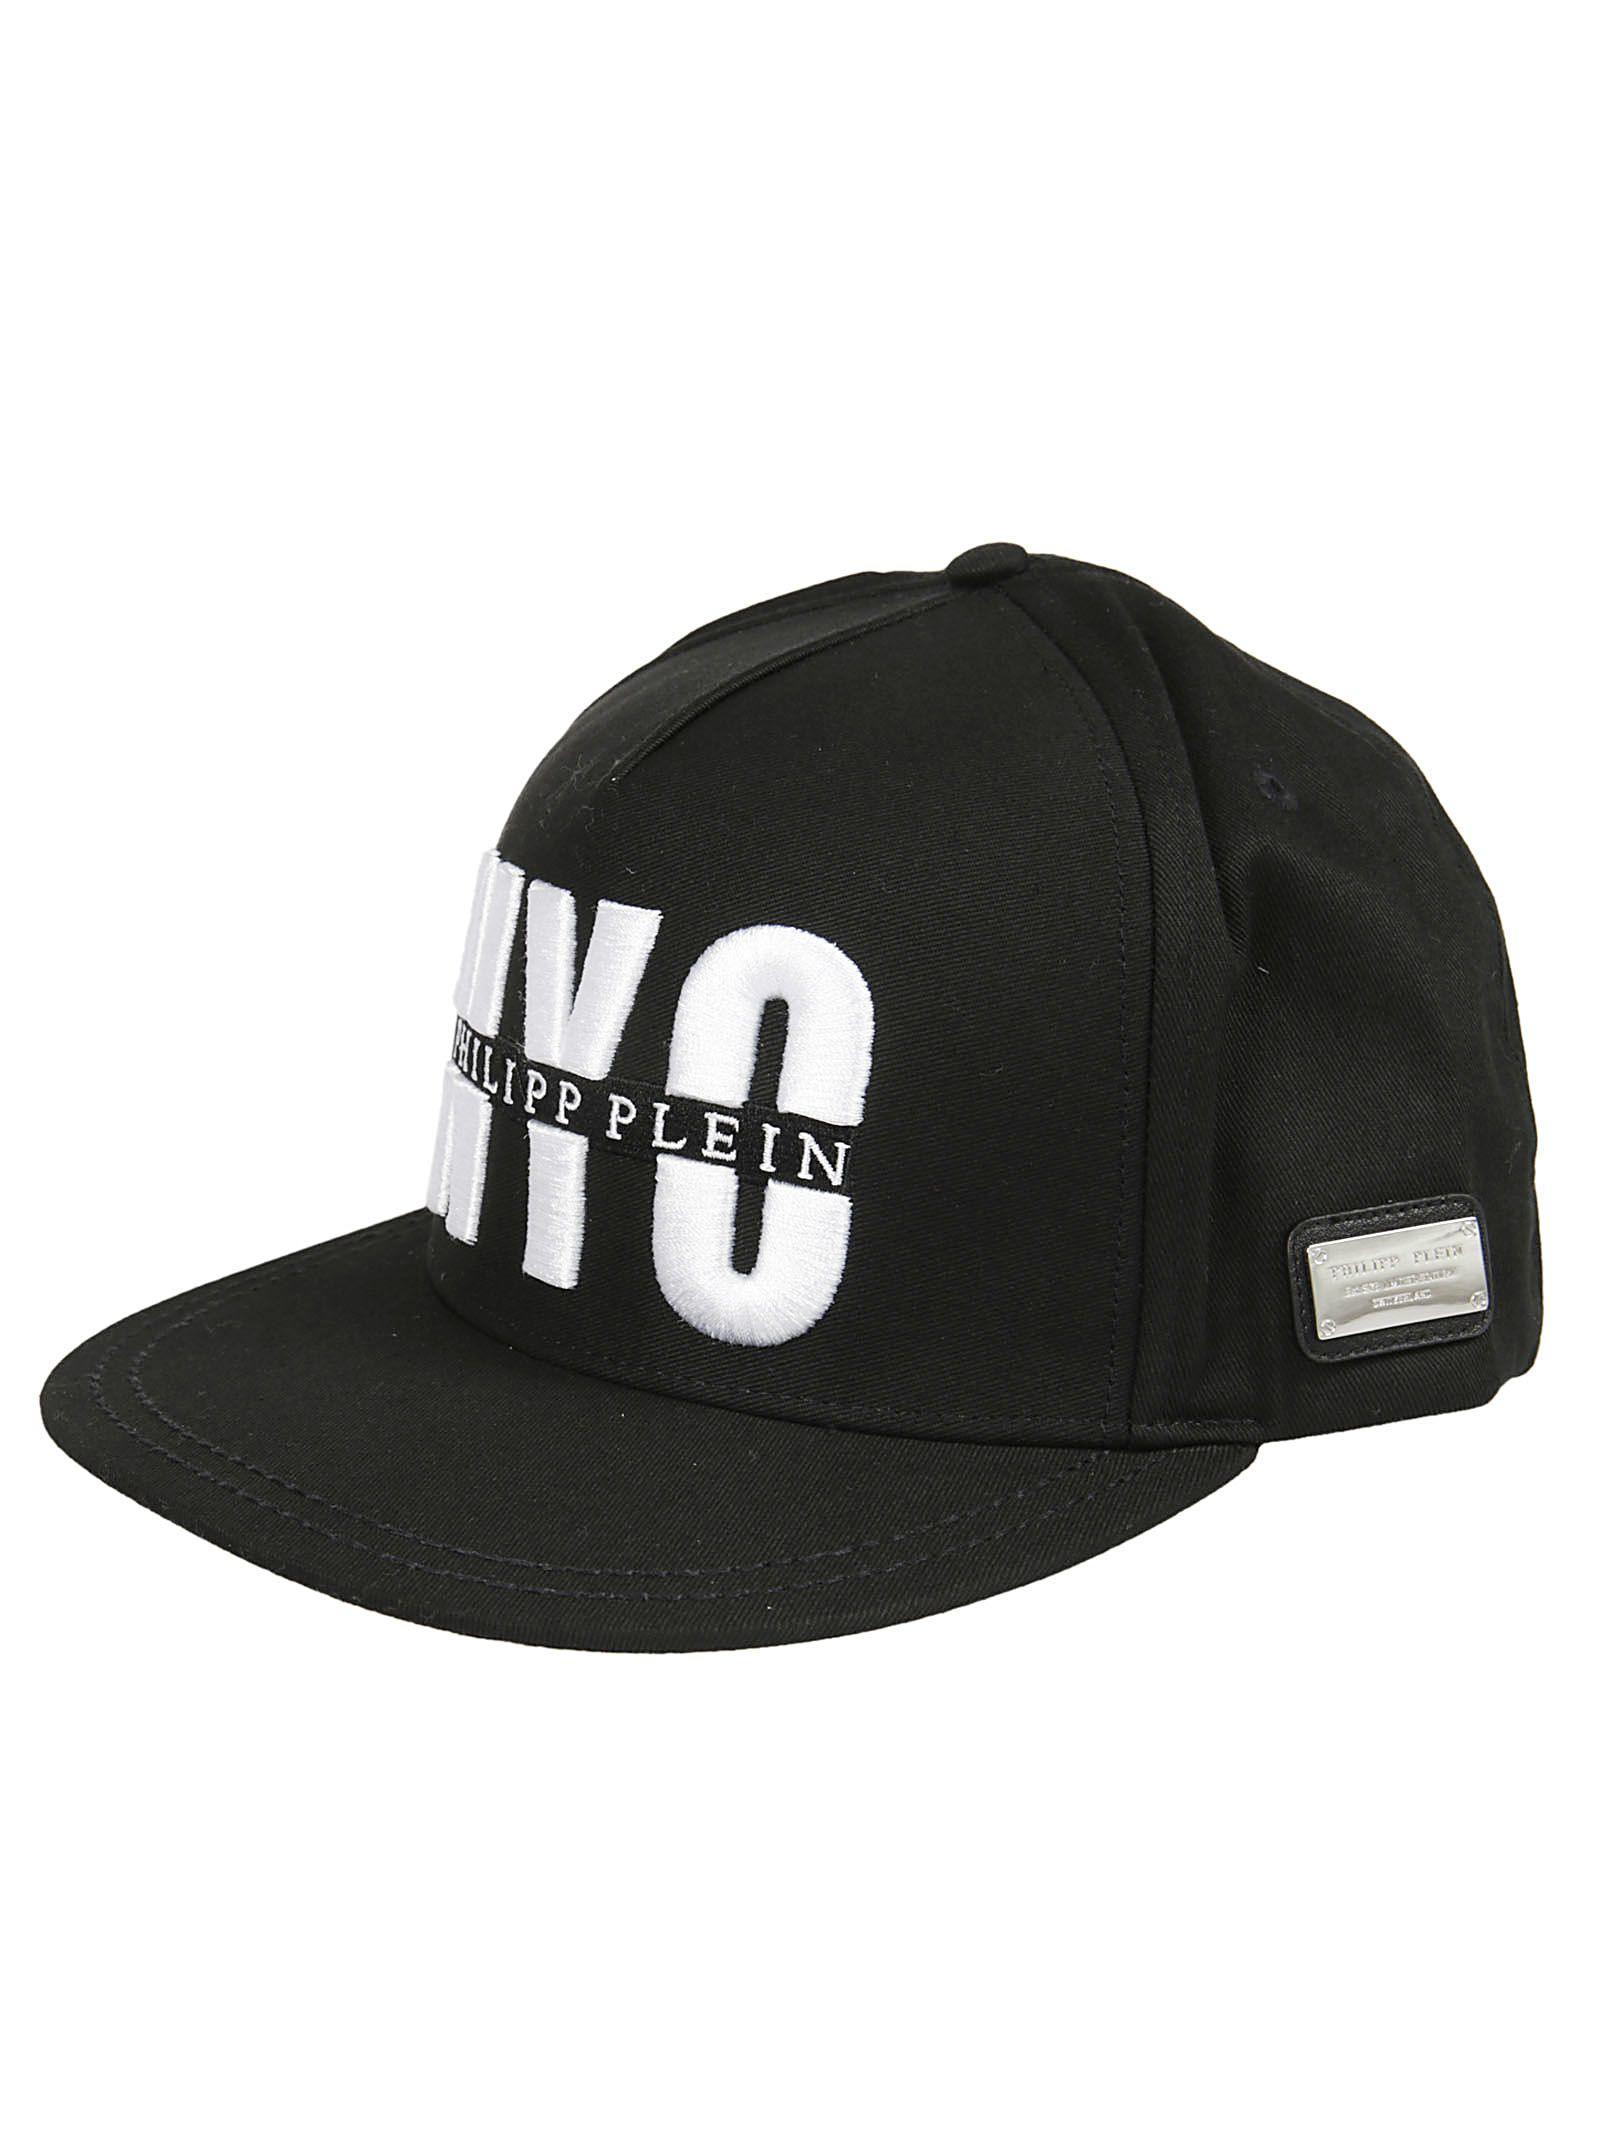 philipp plein philipp plein jamal baseball cap black men 39 s hats italist. Black Bedroom Furniture Sets. Home Design Ideas